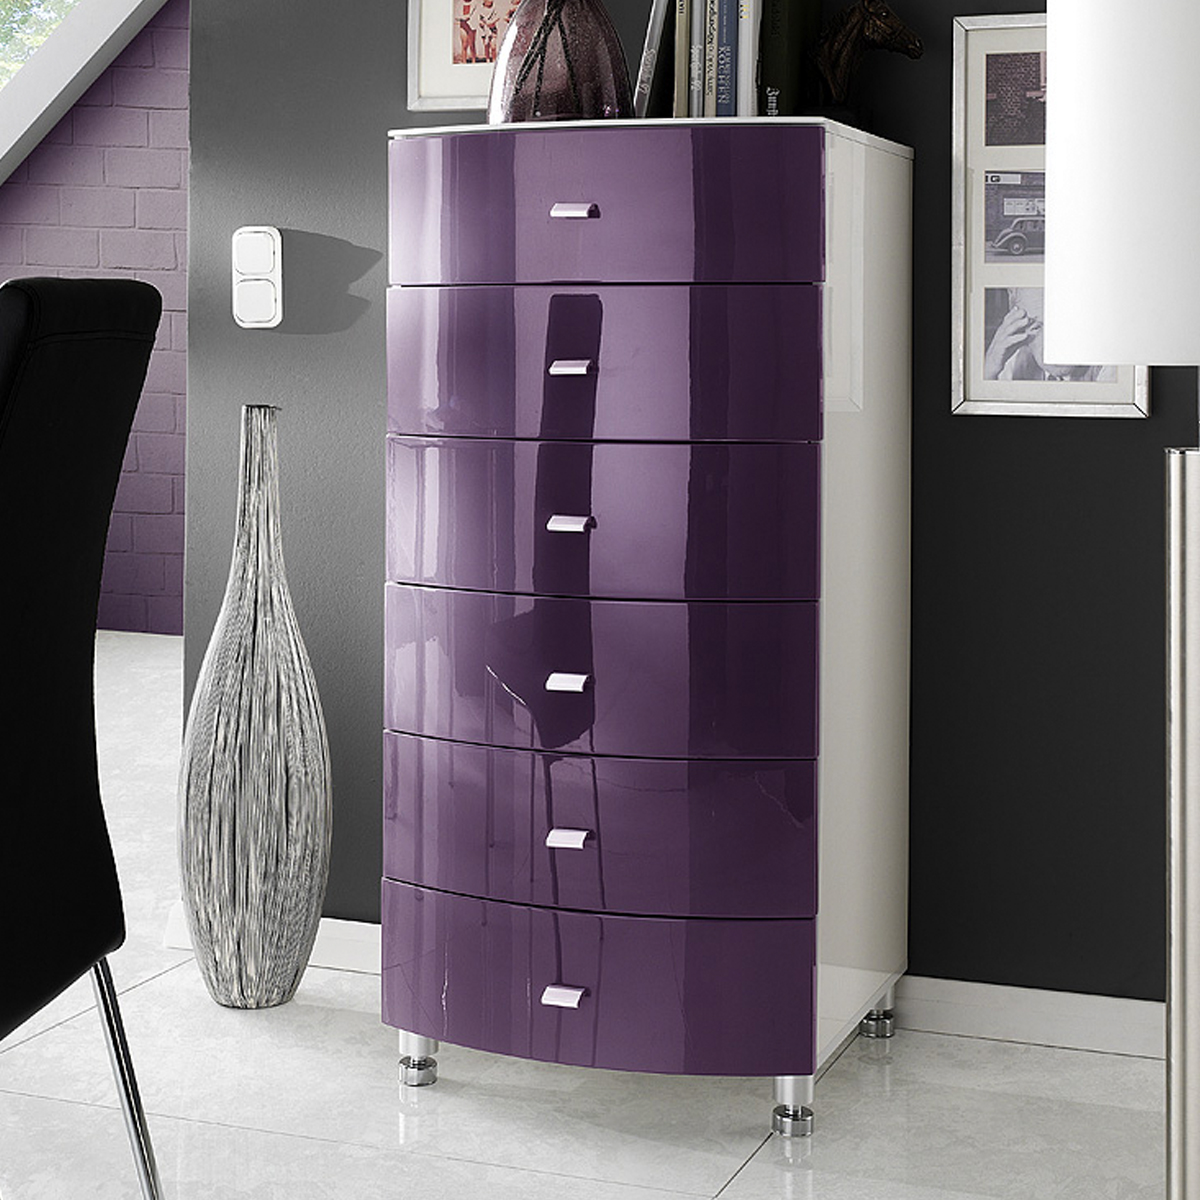 kommode cappo sideboard wei lila hochglanz neu ebay. Black Bedroom Furniture Sets. Home Design Ideas